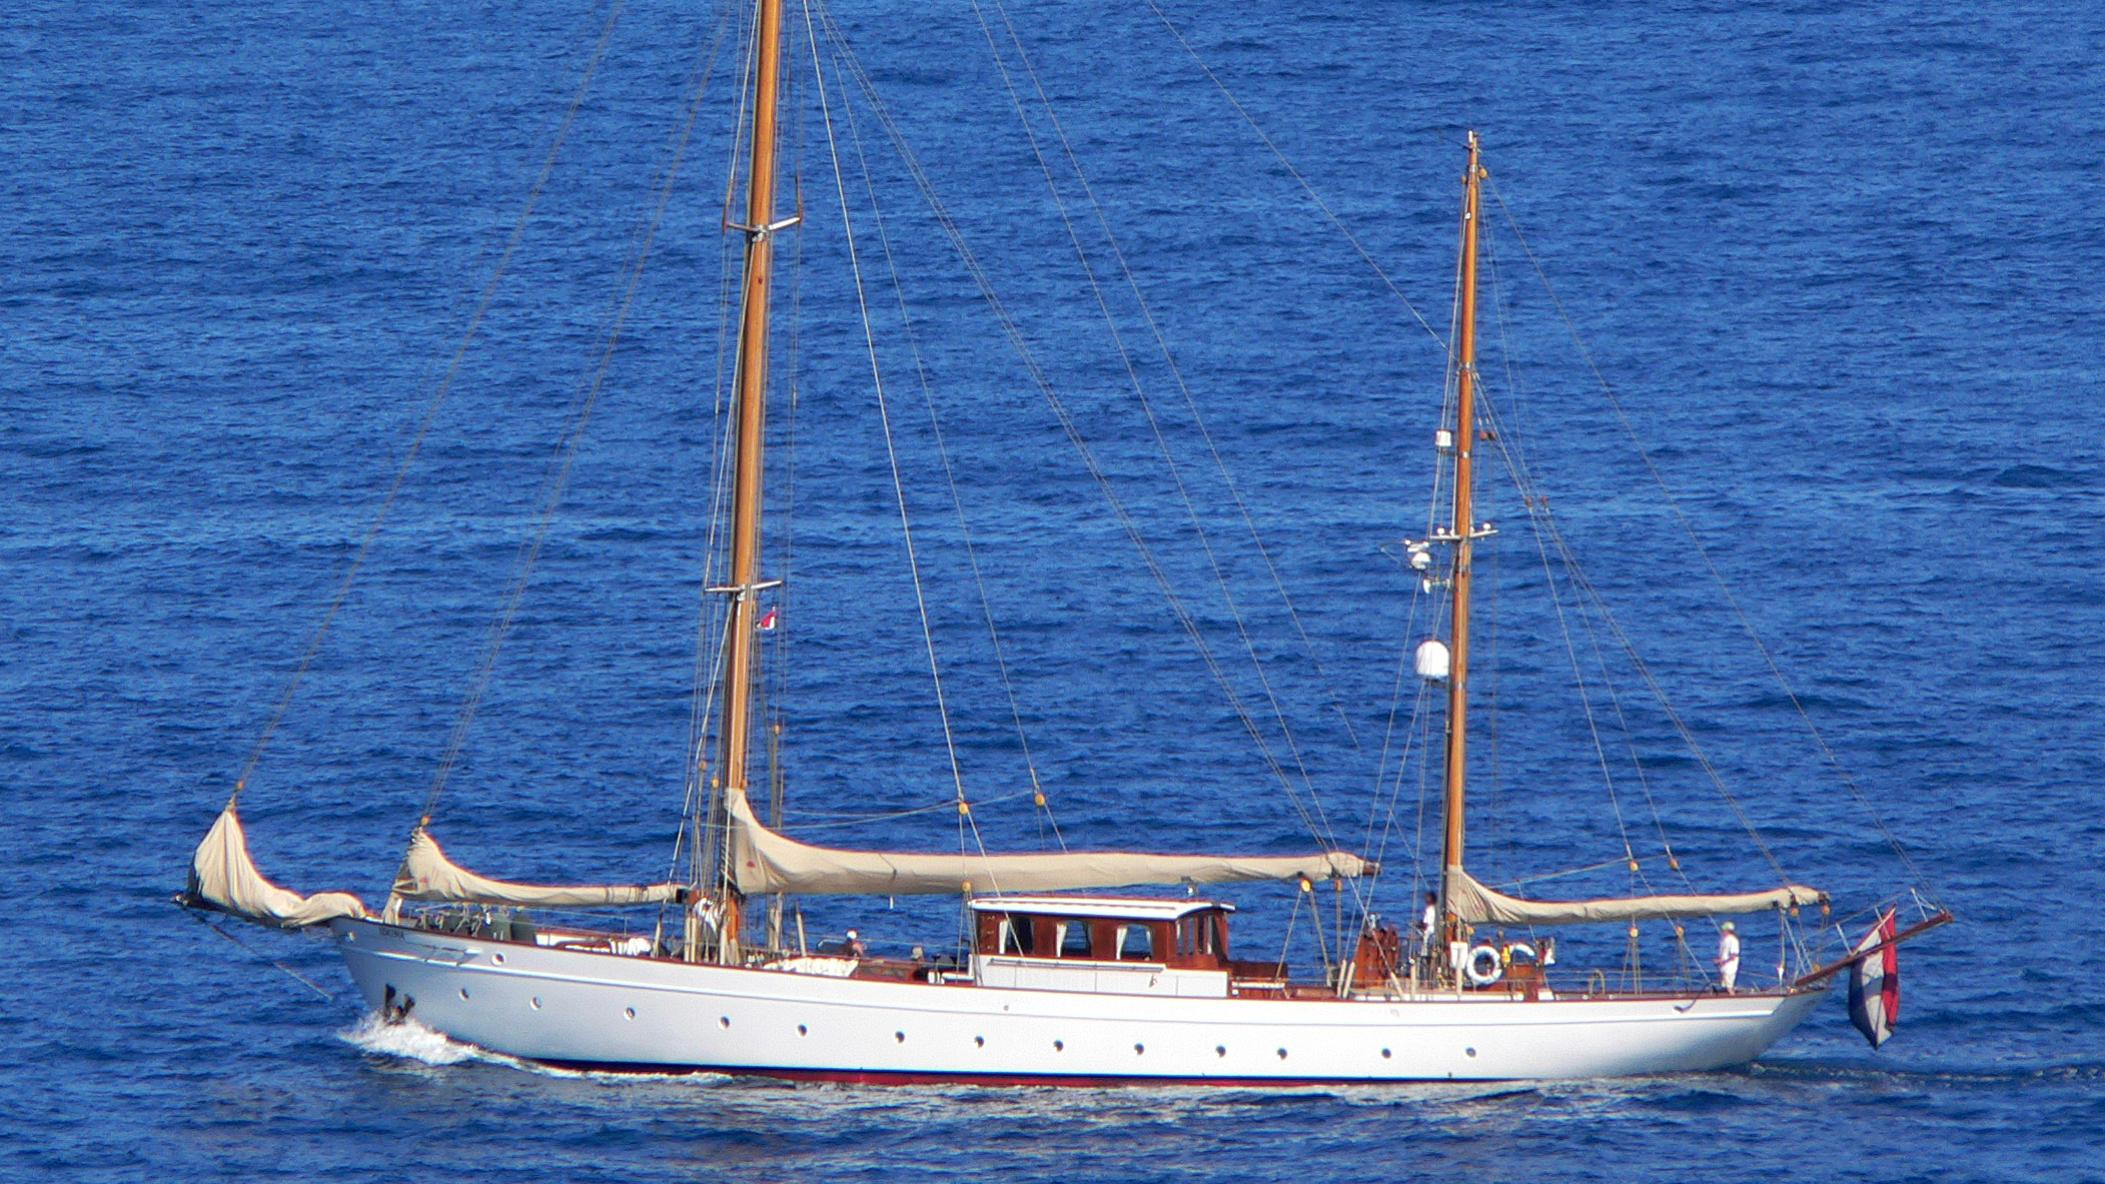 iduna-sailing-yacht-de-vlijt-1939-34m-moored-profile